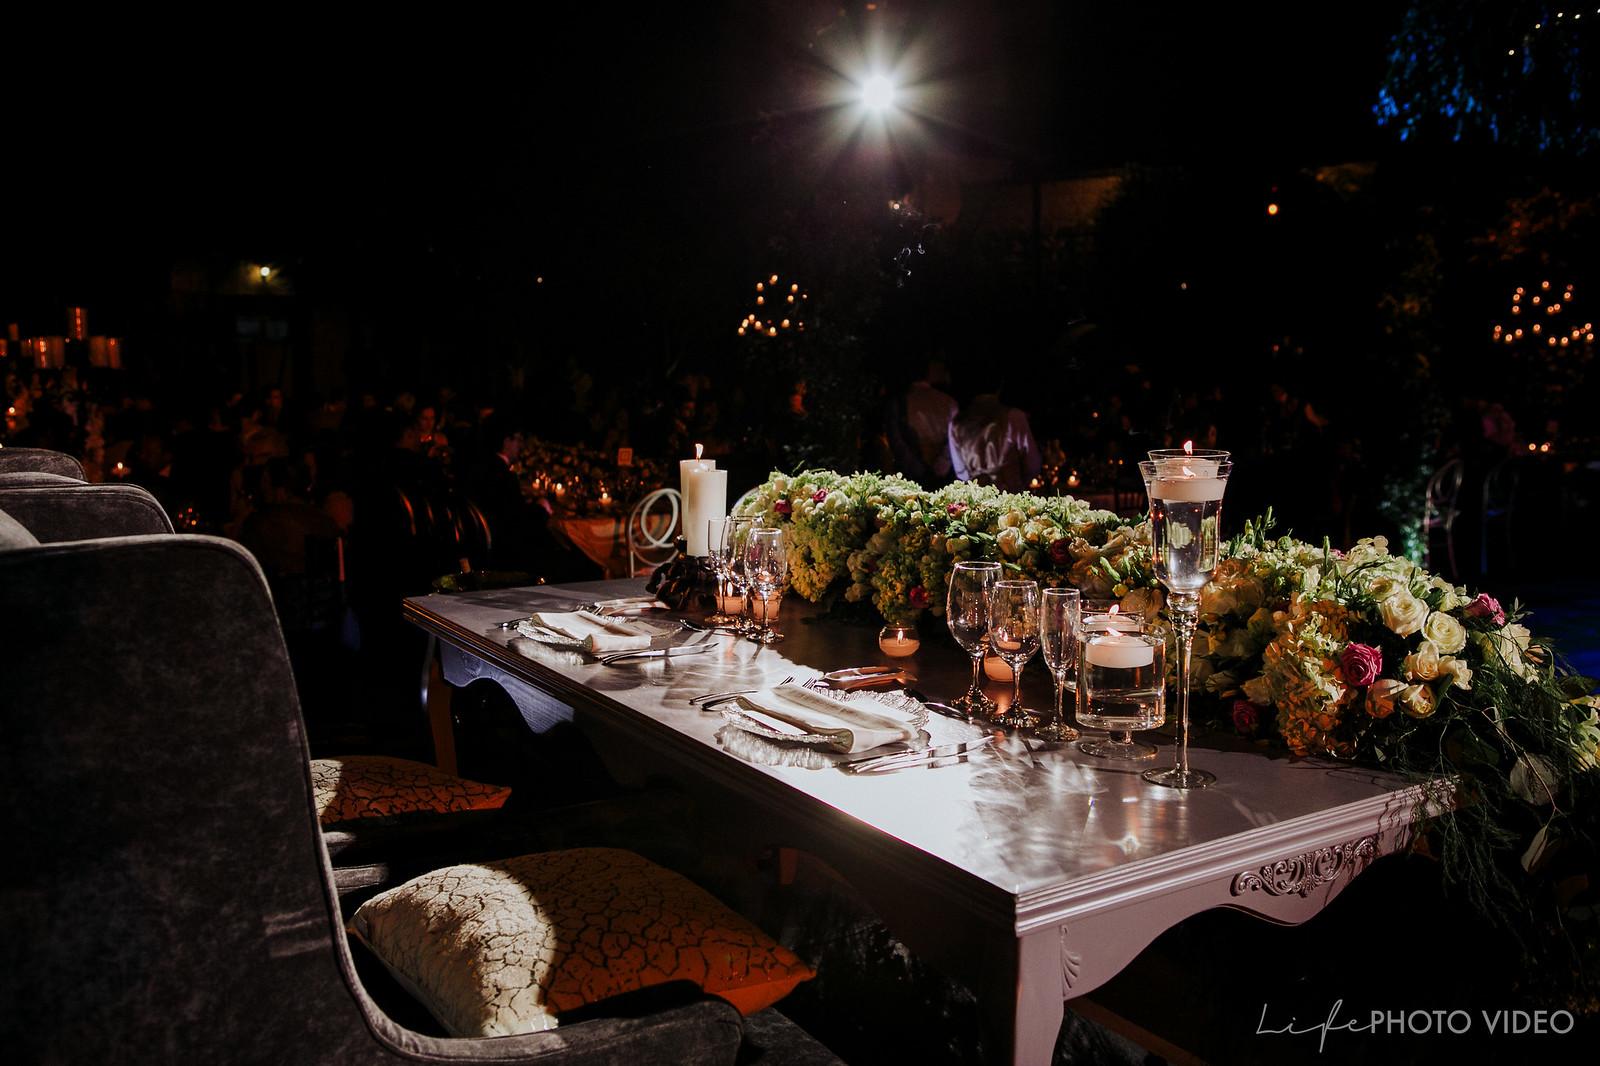 LifePhotoVideo_Boda_Guanajuato_Wedding_0053